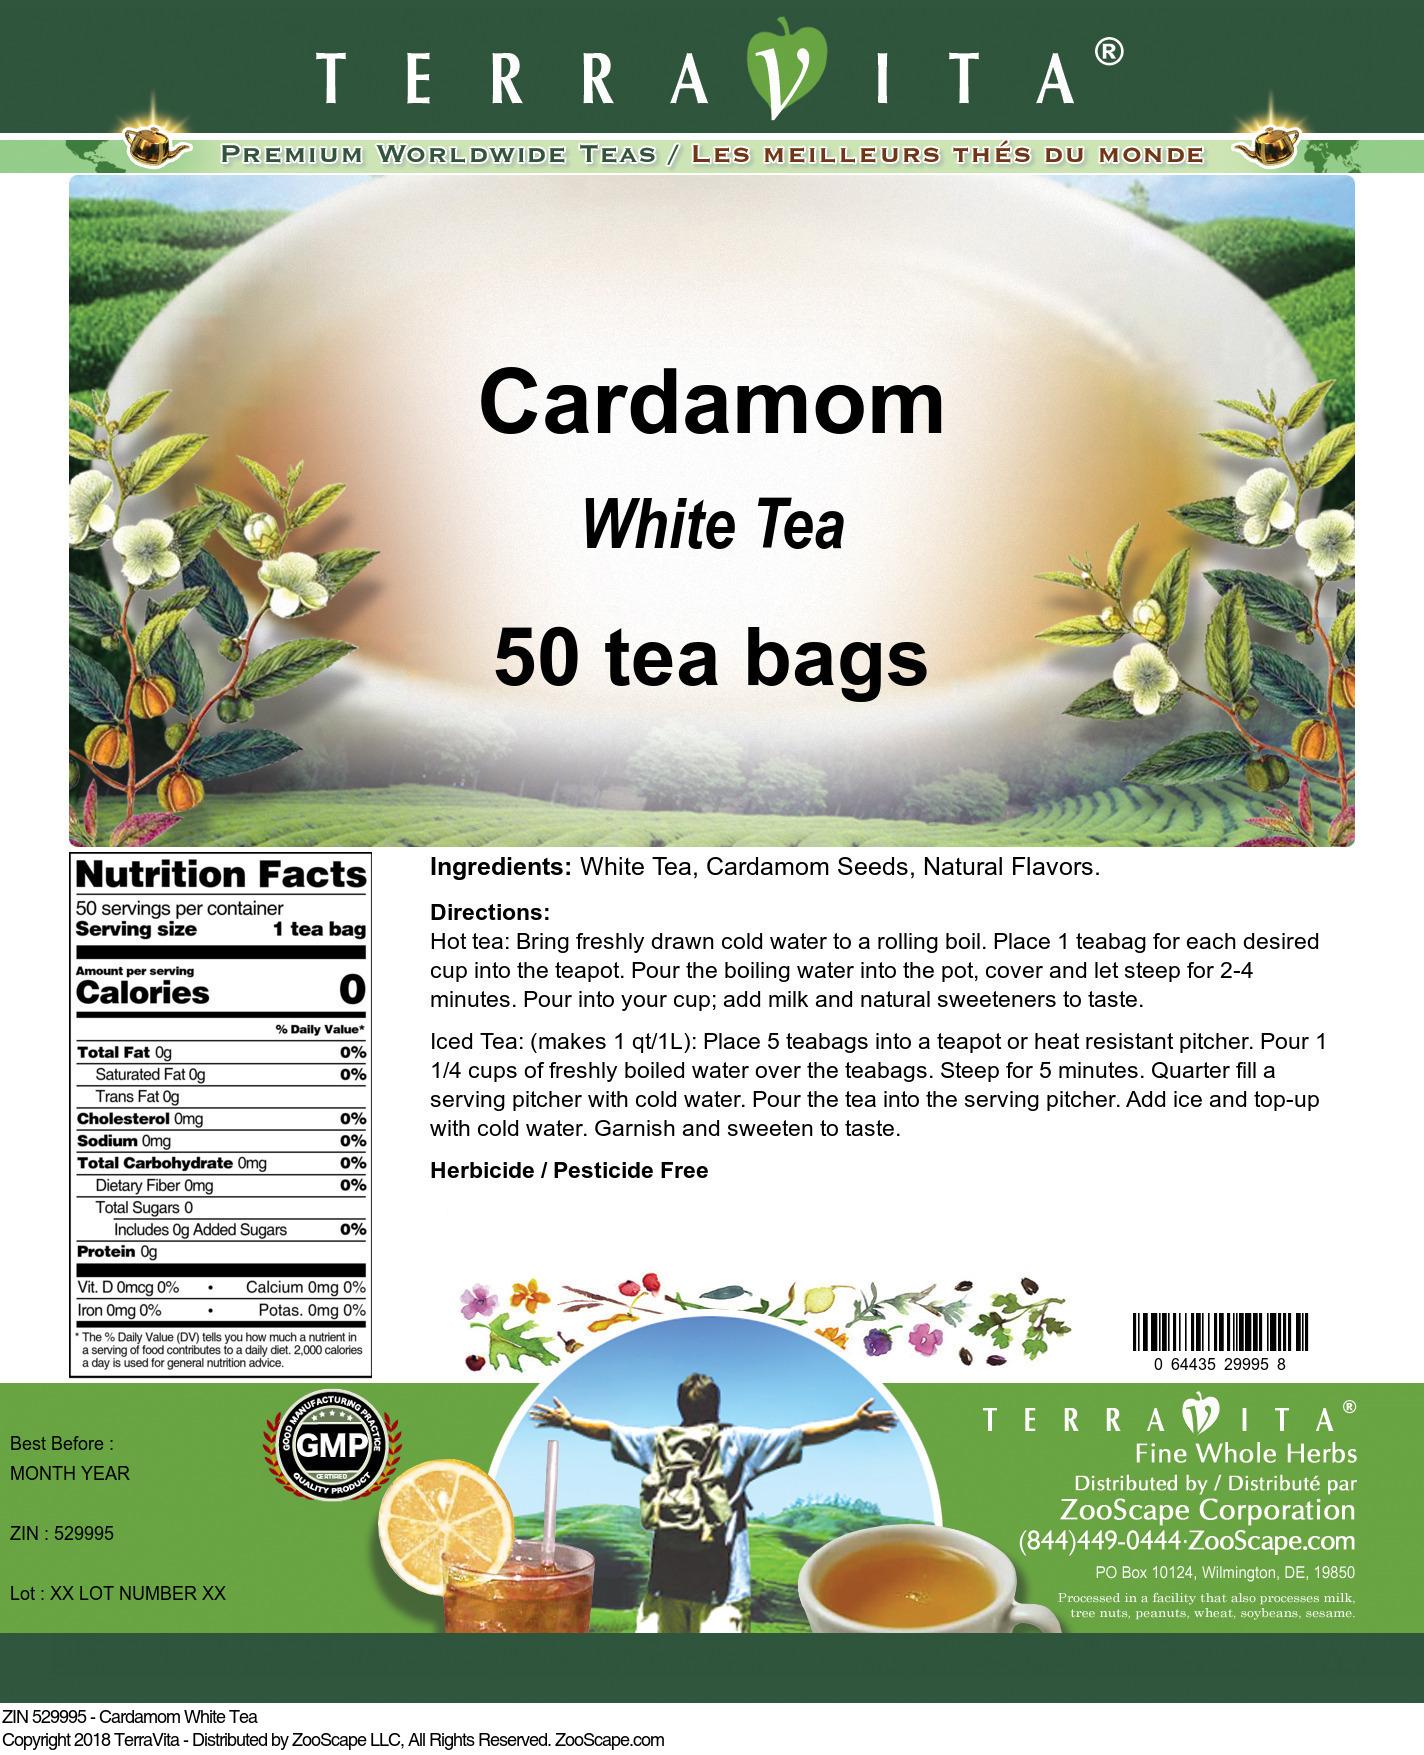 Cardamom White Tea